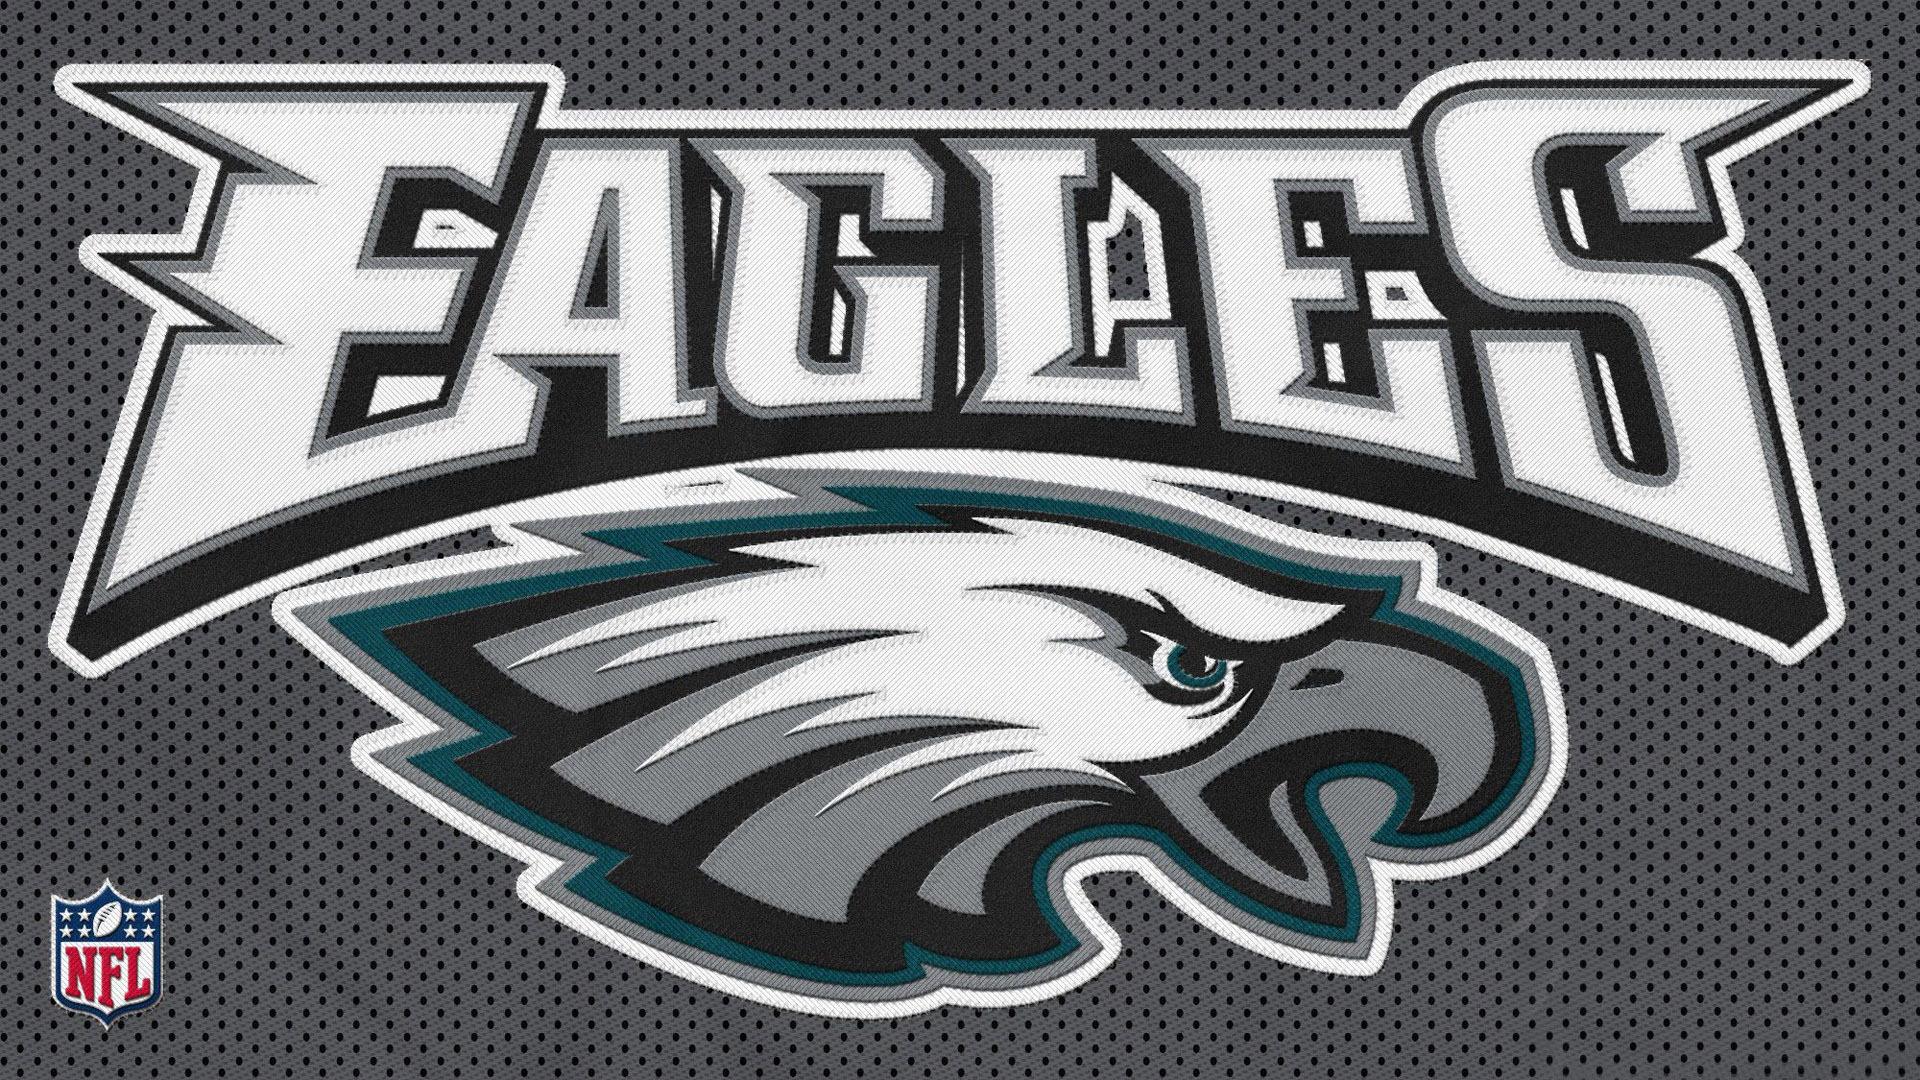 Philadelphia Eagles High Definition Wallpapers